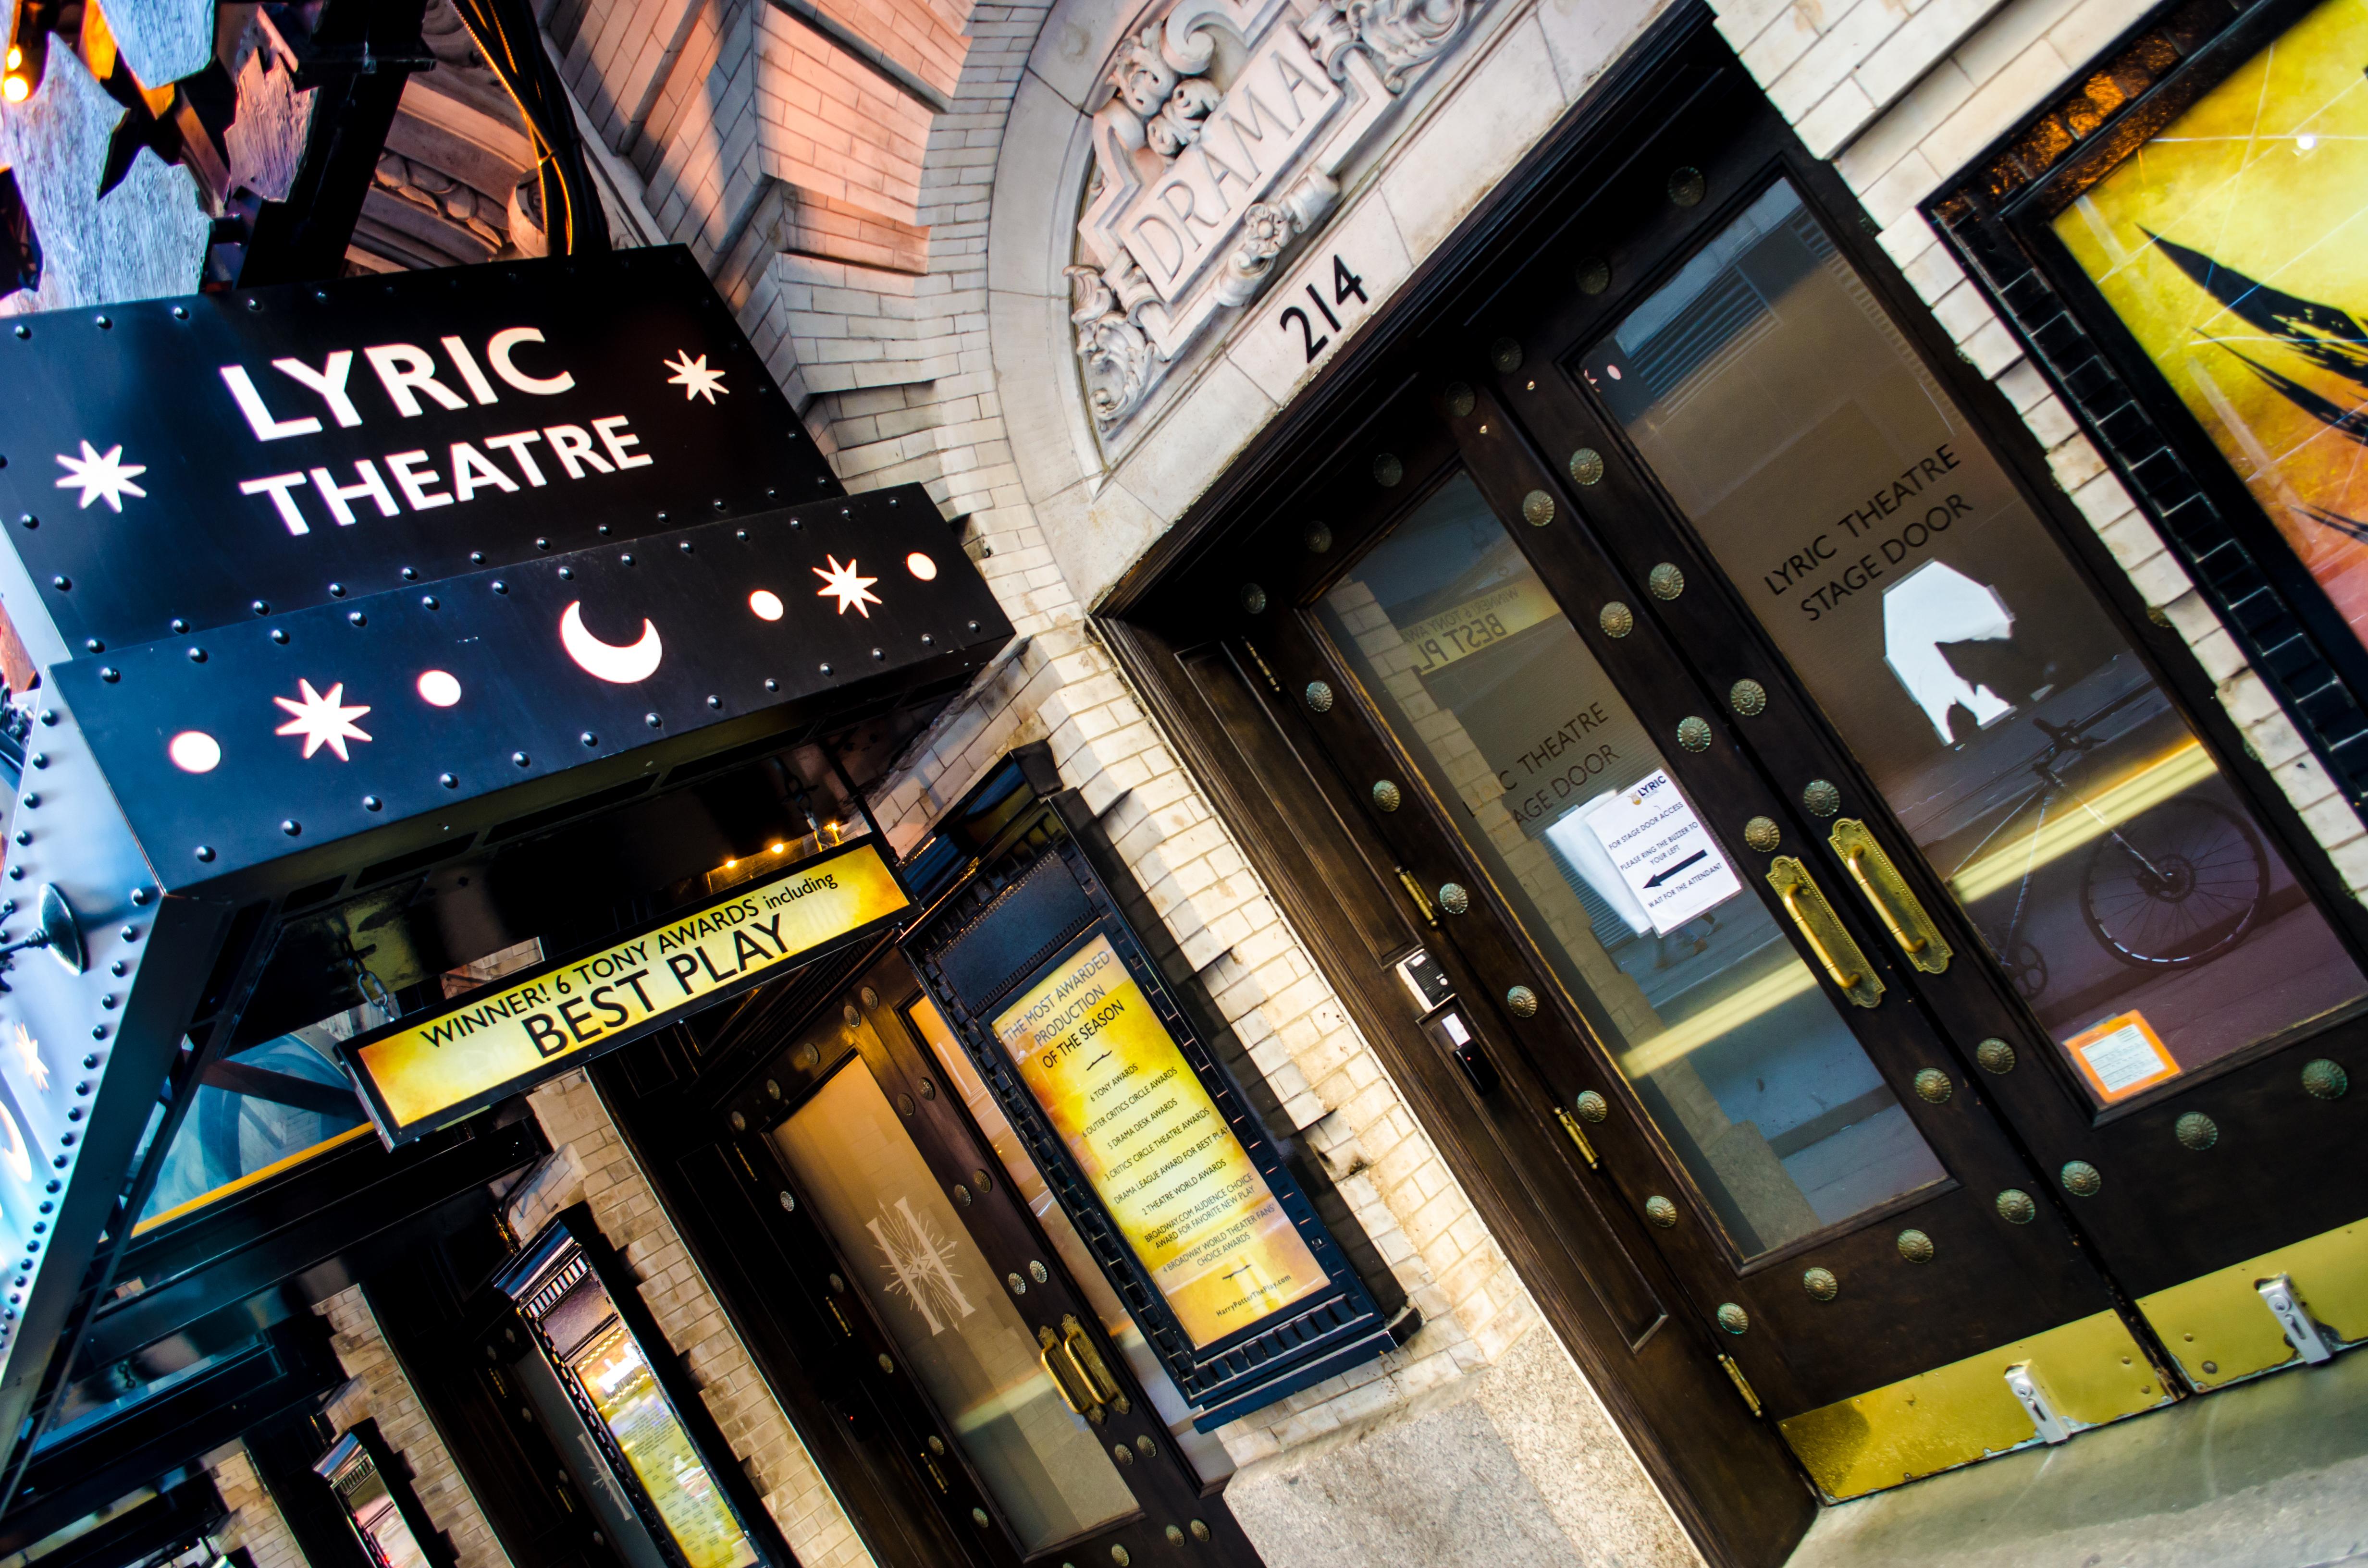 Lyric Theatre (Broadway) - Theater Information Stage Door